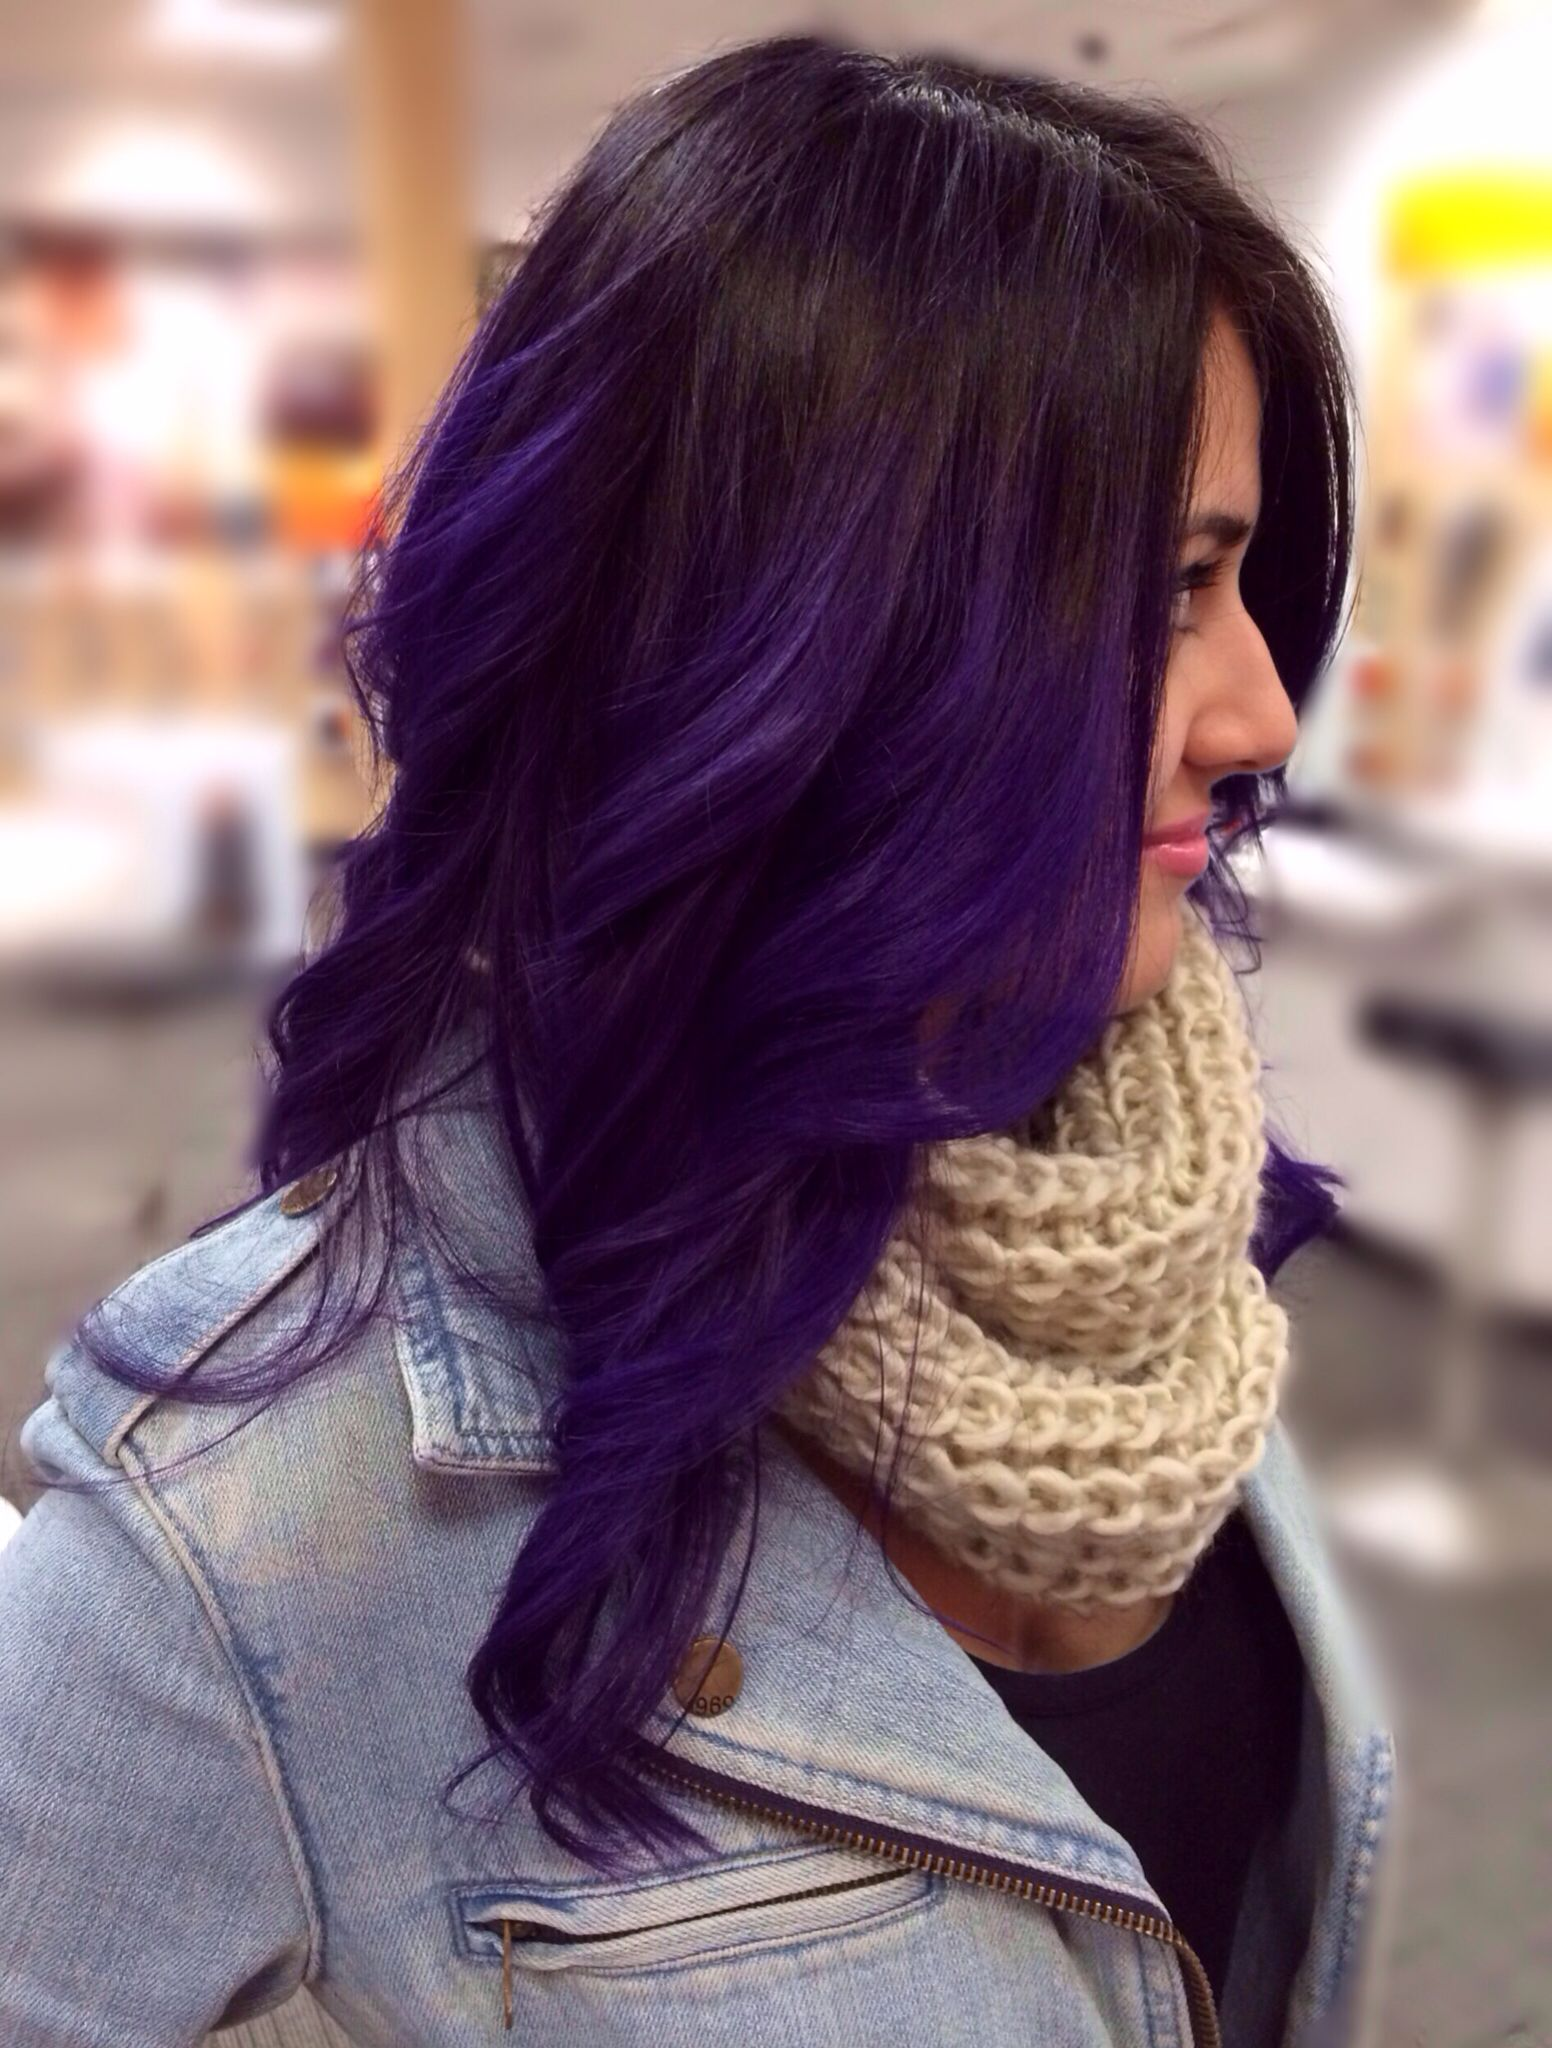 Purple hair hairstylepeinados pinterest hair coloring hair